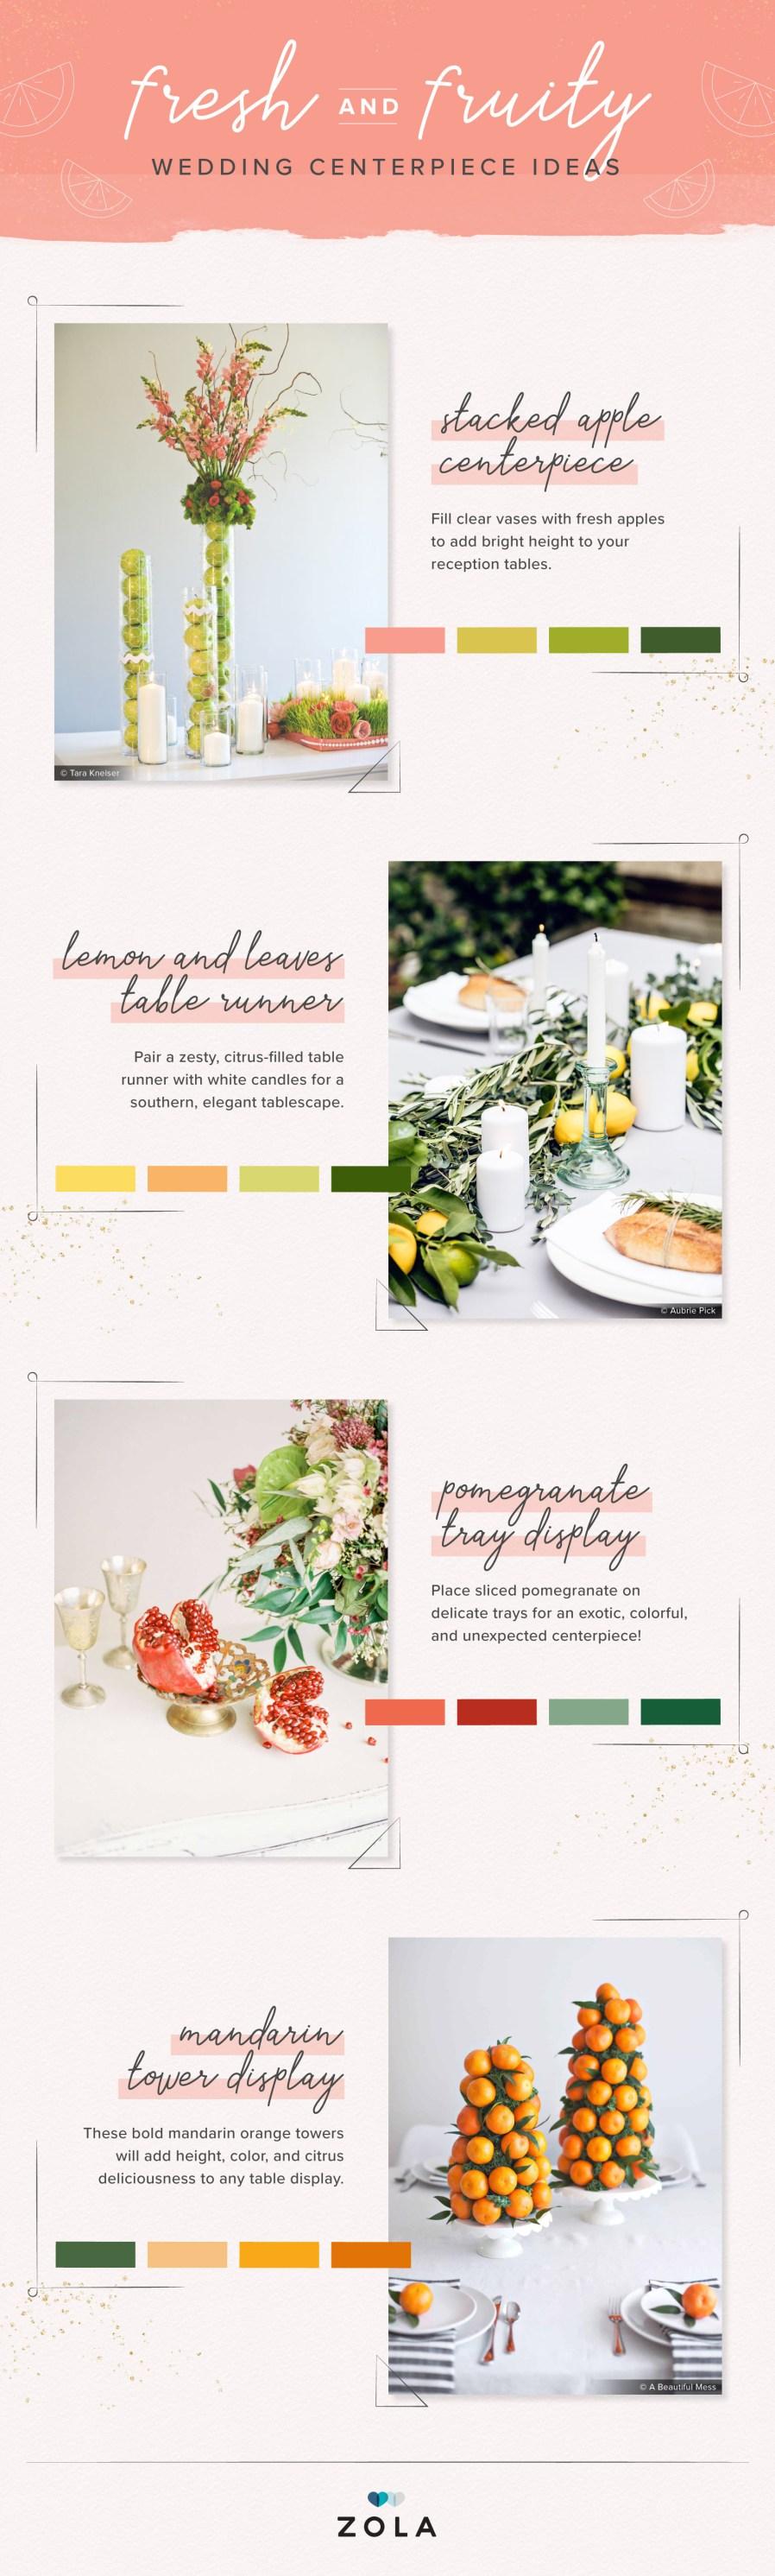 Fresh and Fruity Wedding Centerpiece Ideas